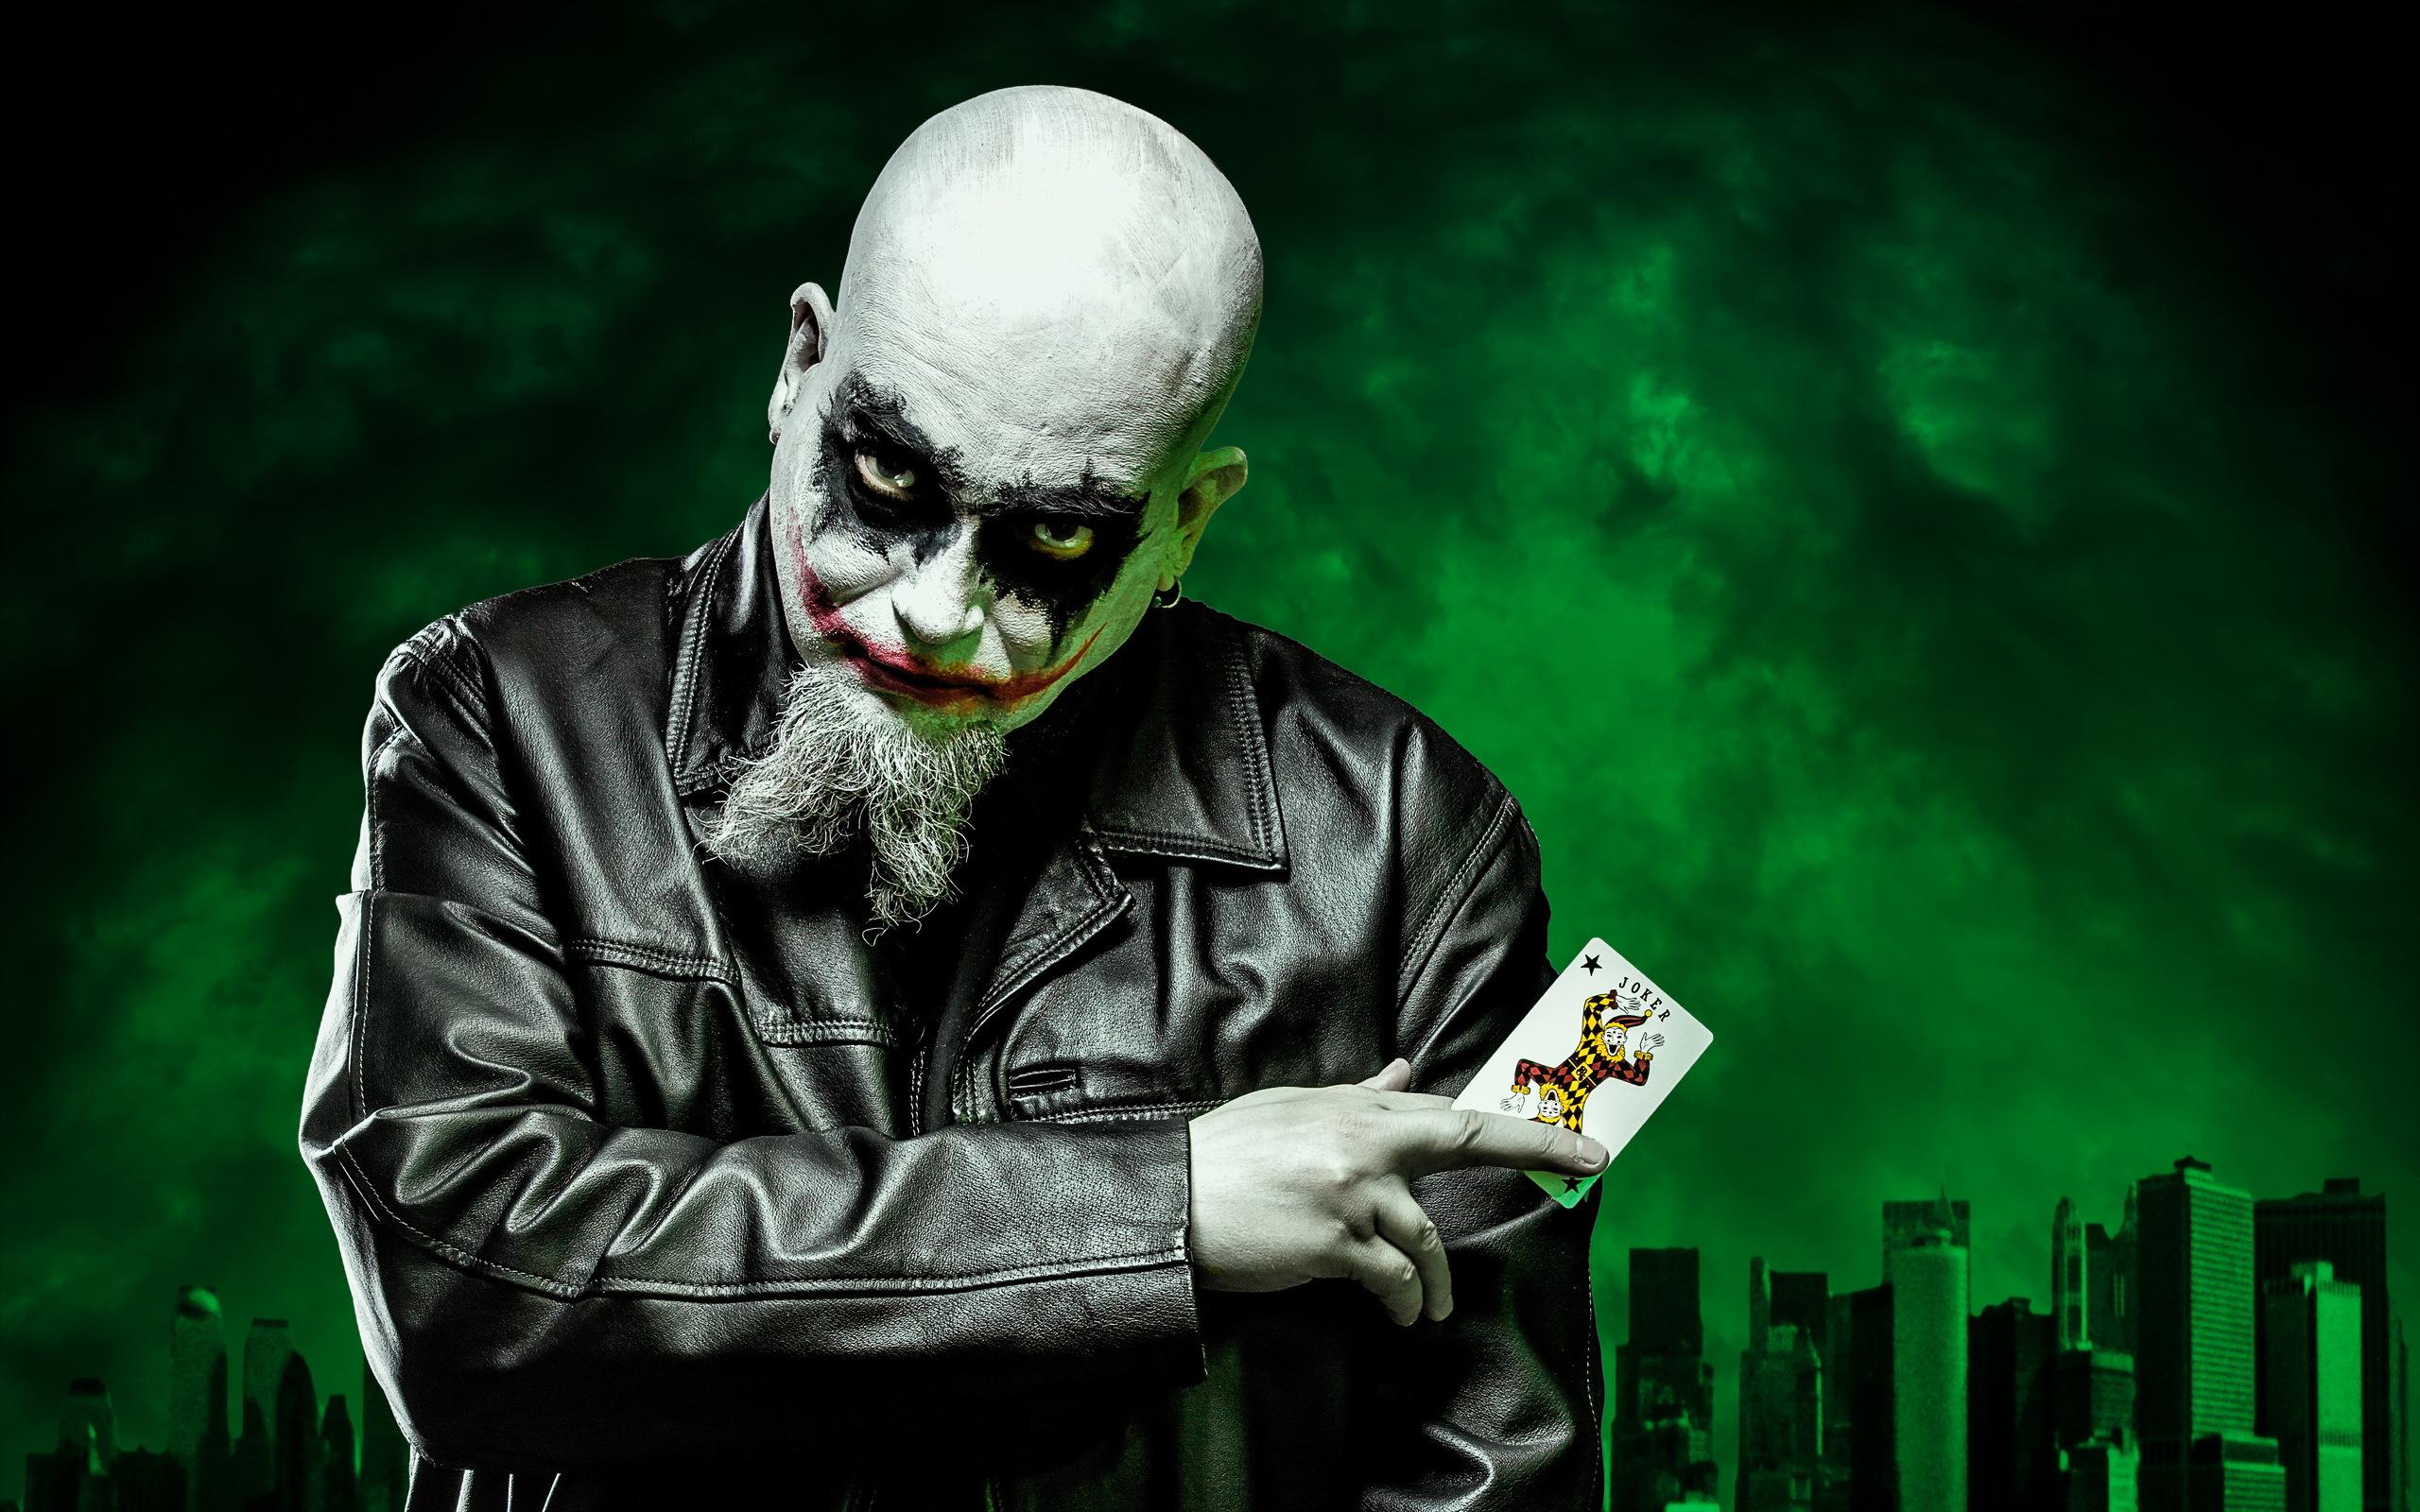 Joker джокер  обои и картинки на рабочий стол